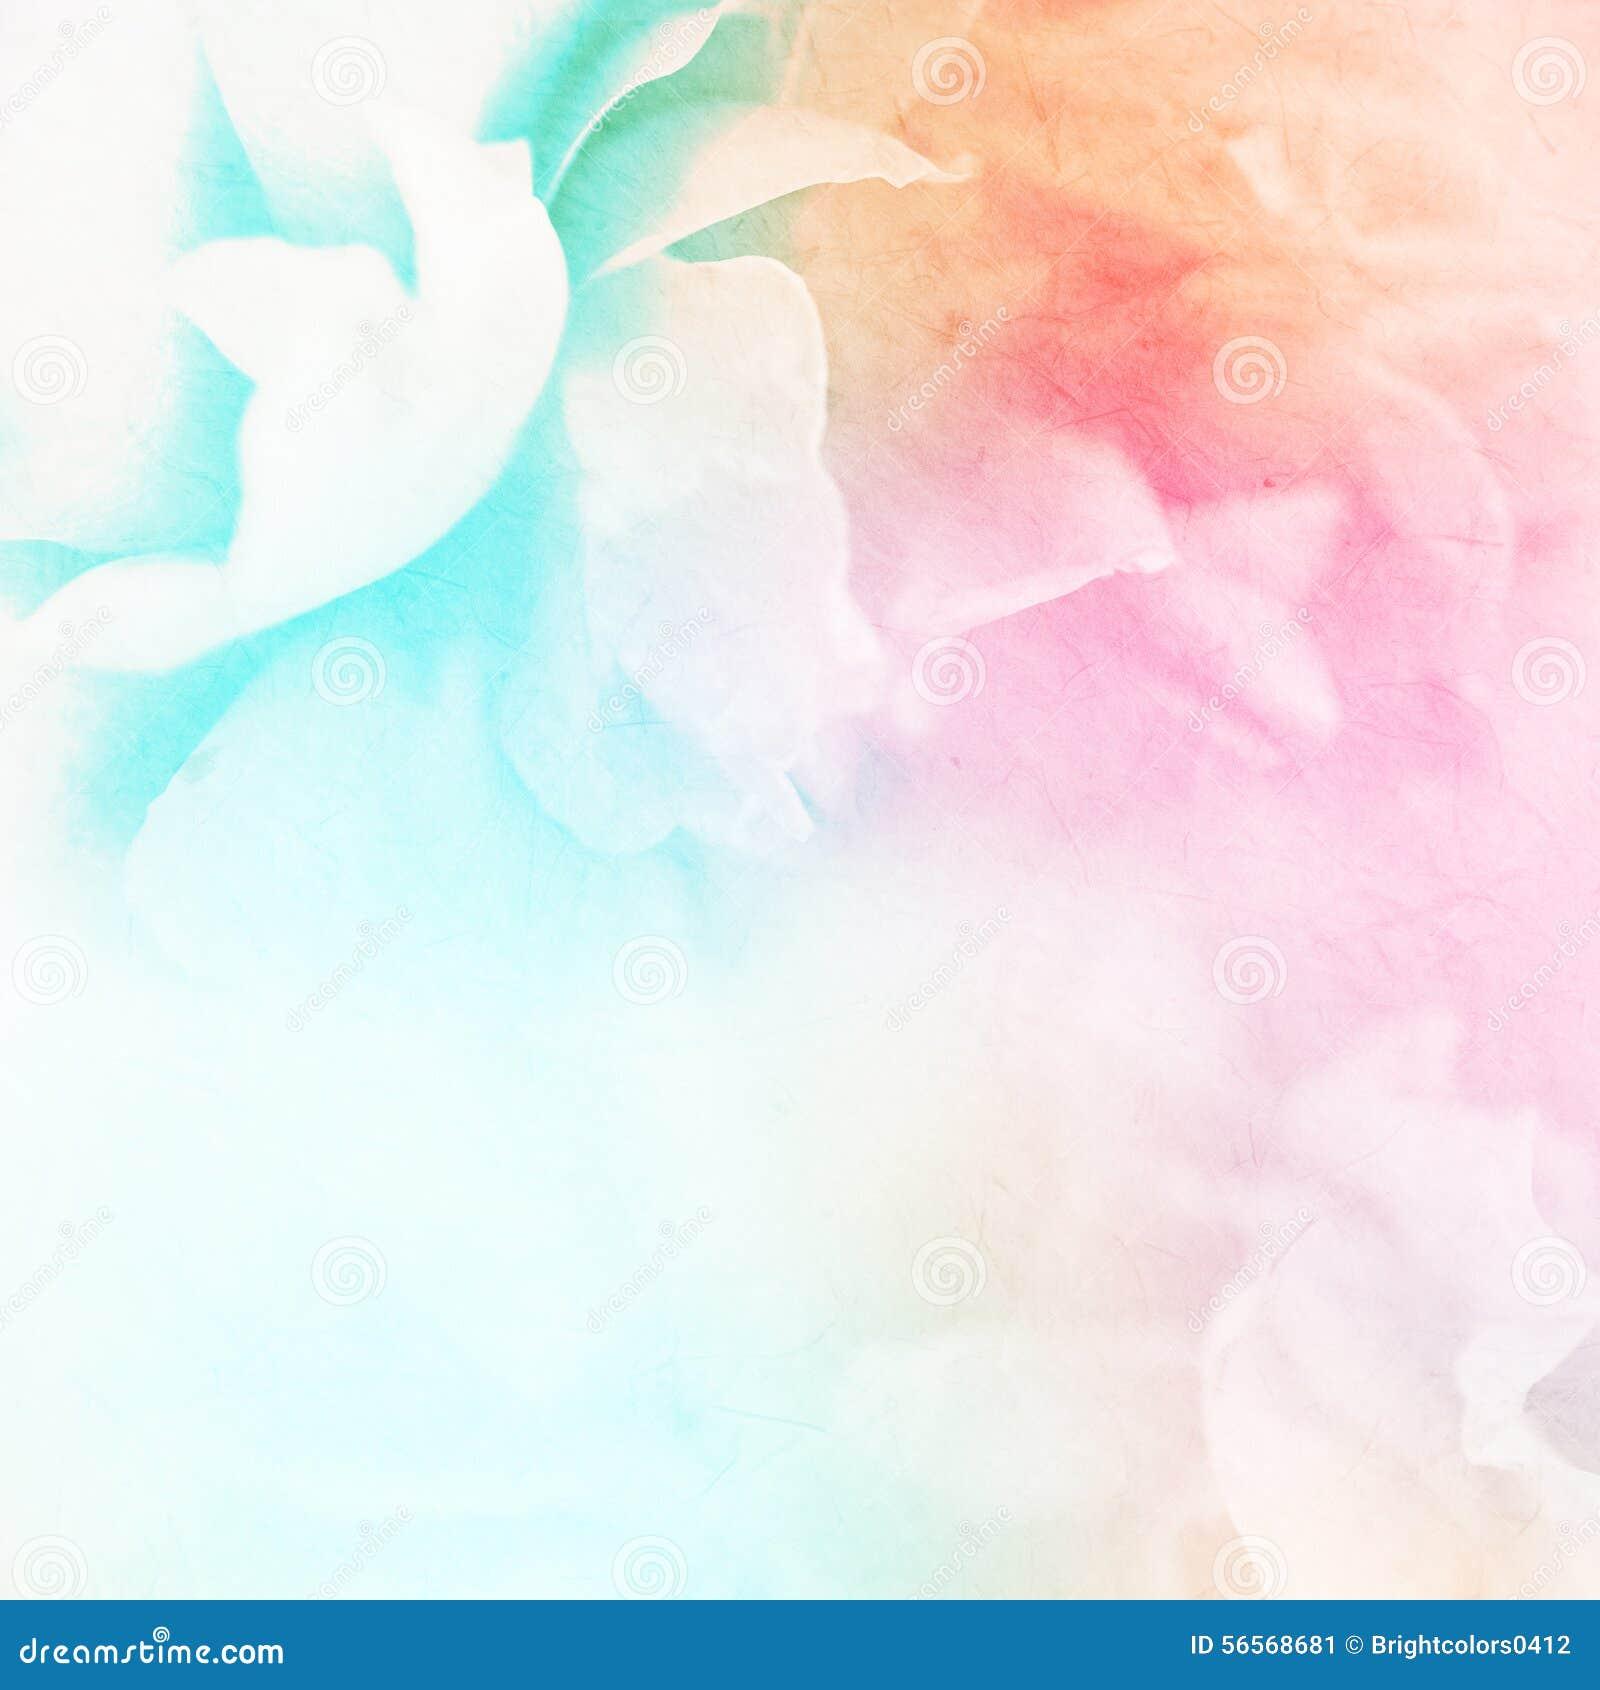 Download Τα γλυκά τριαντάφυλλα χρώματος ανθίζουν στο μαλακό και ύφος θαμπάδων στη σύσταση εγγράφου μουριών Στοκ Εικόνα - εικόνα από αποχής, και: 56568681